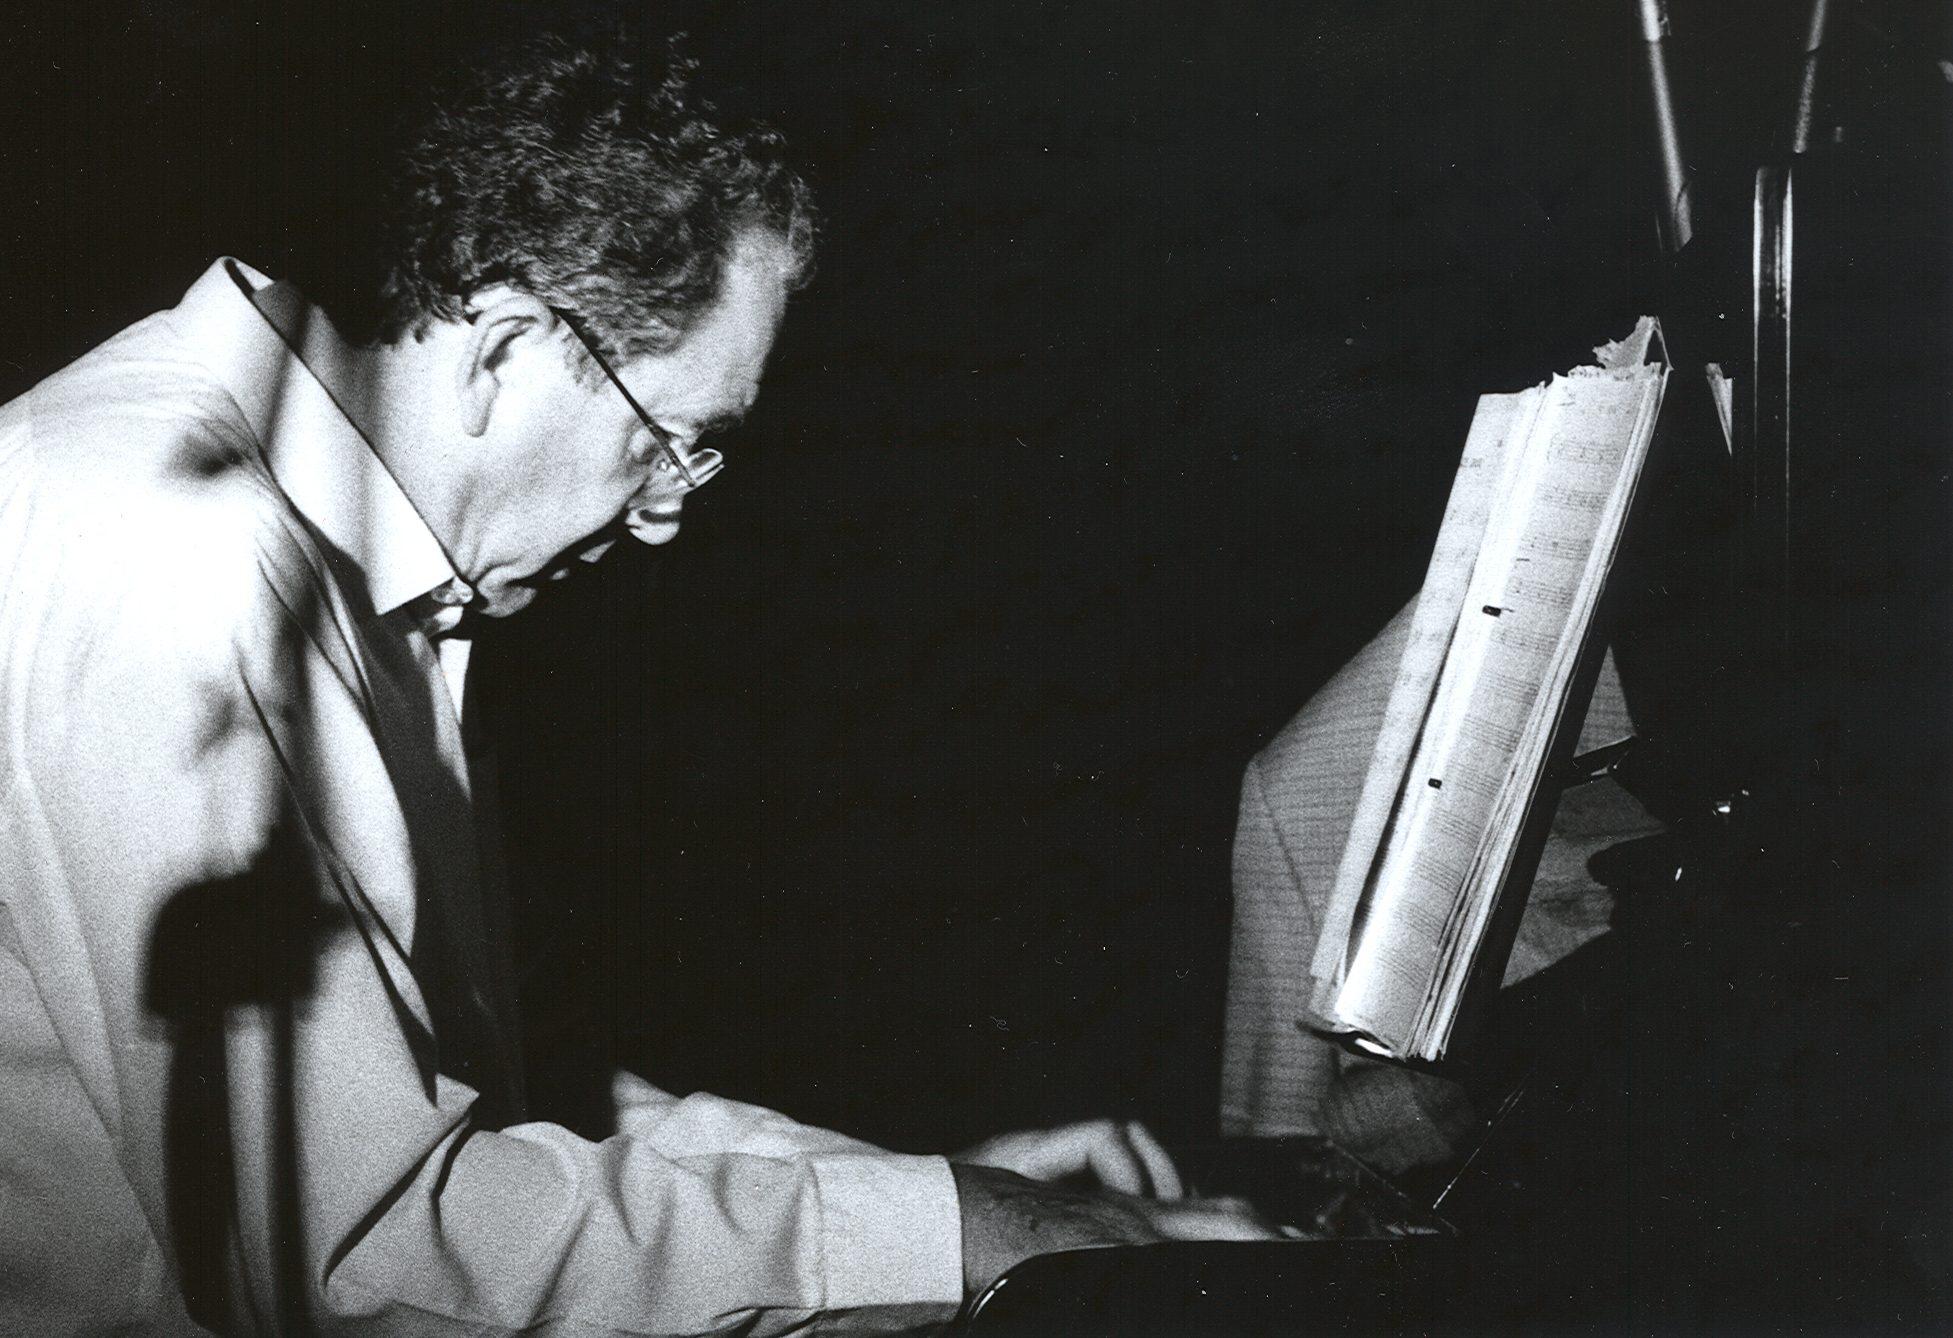 Léo Flechet